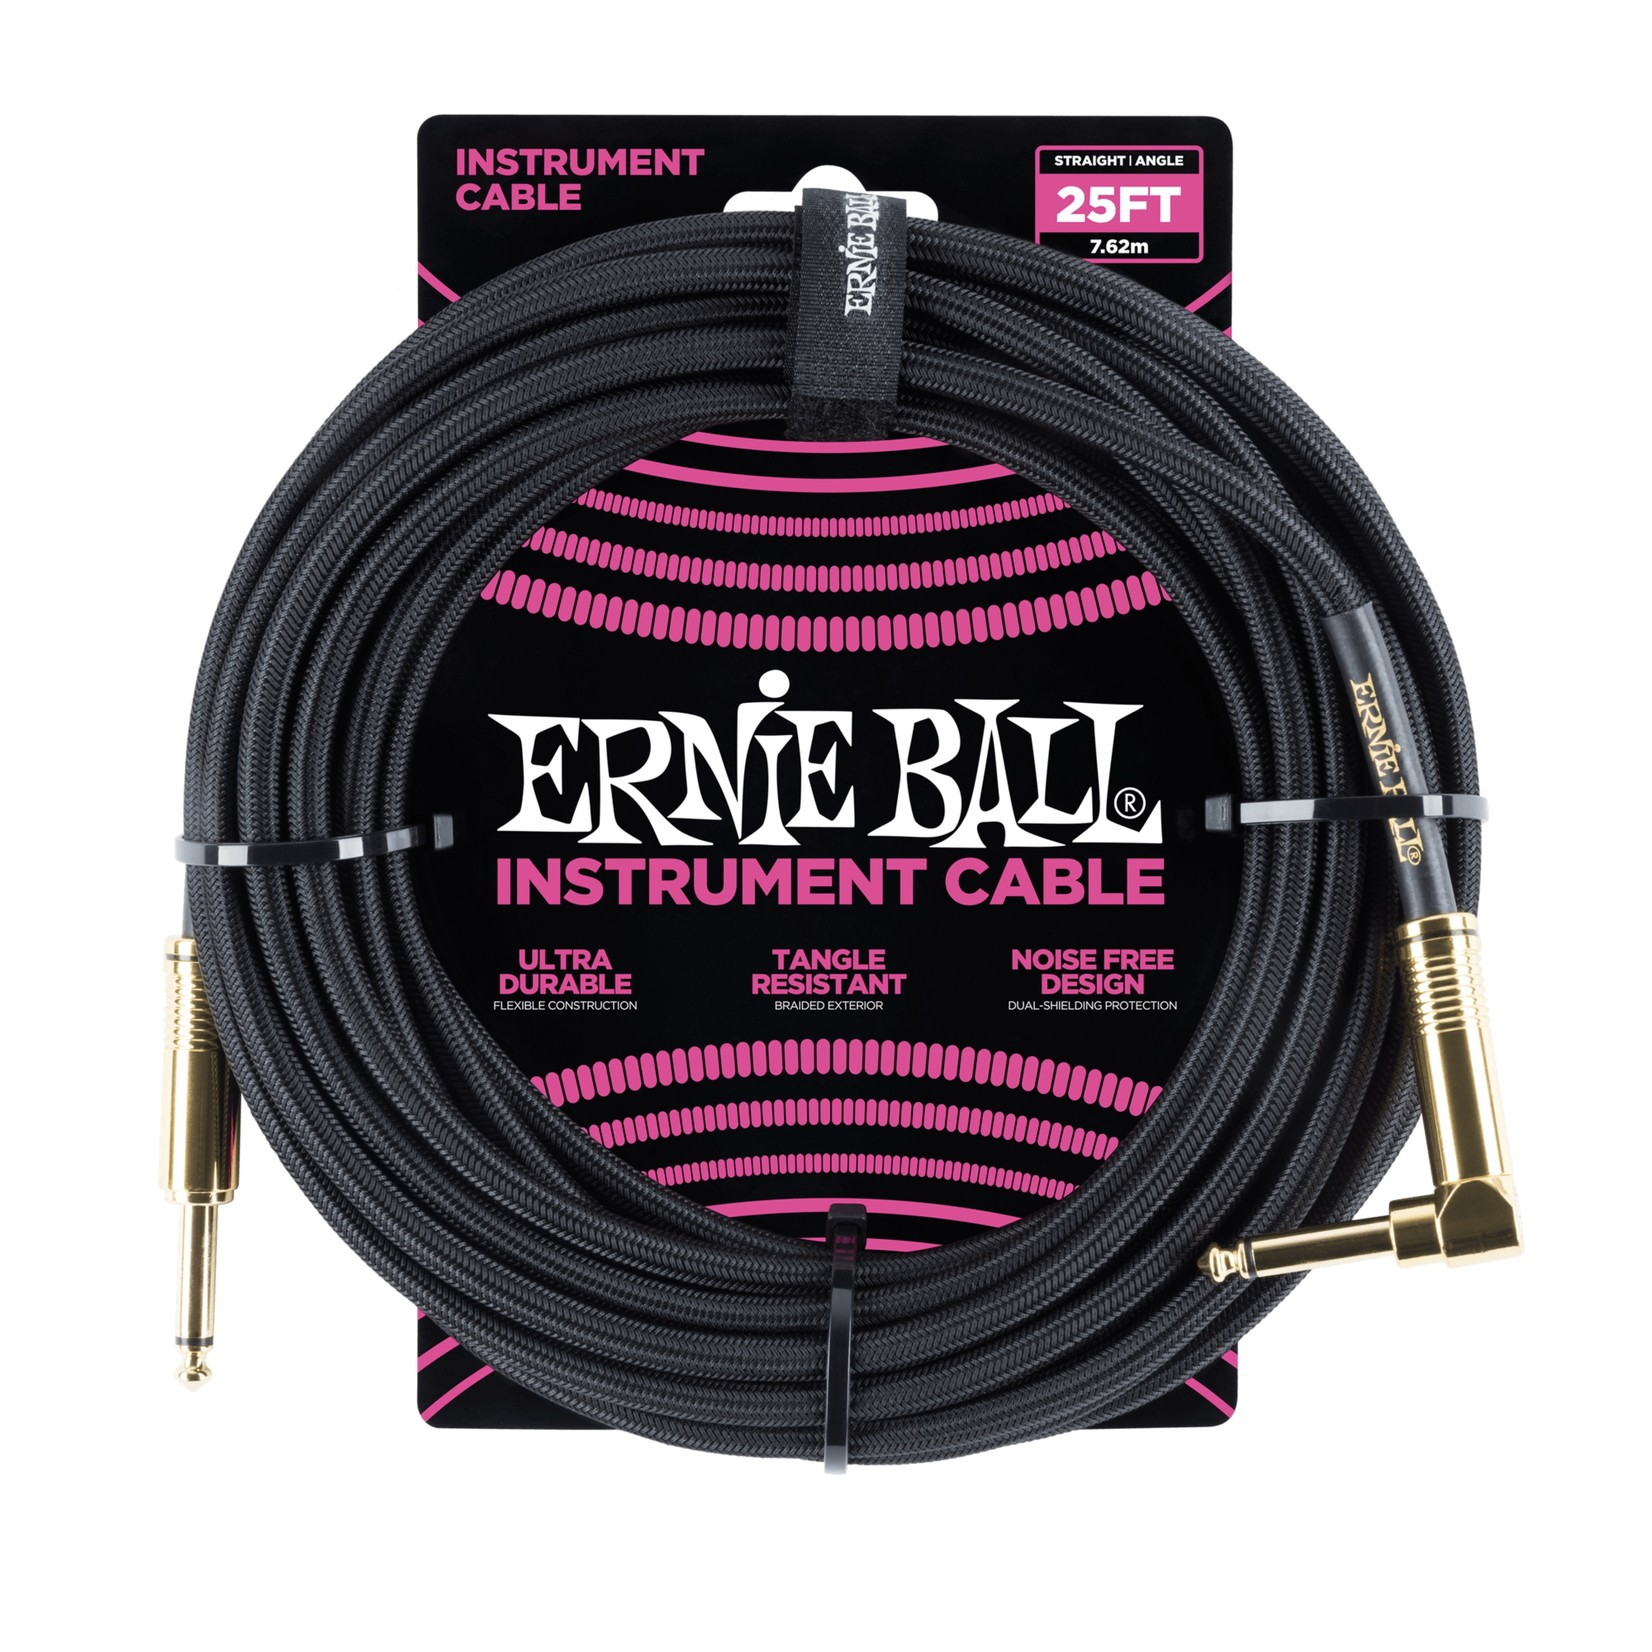 Ernie Ball Ernie Ball 25' Braided Straight / Angle Instrument Cable - Black